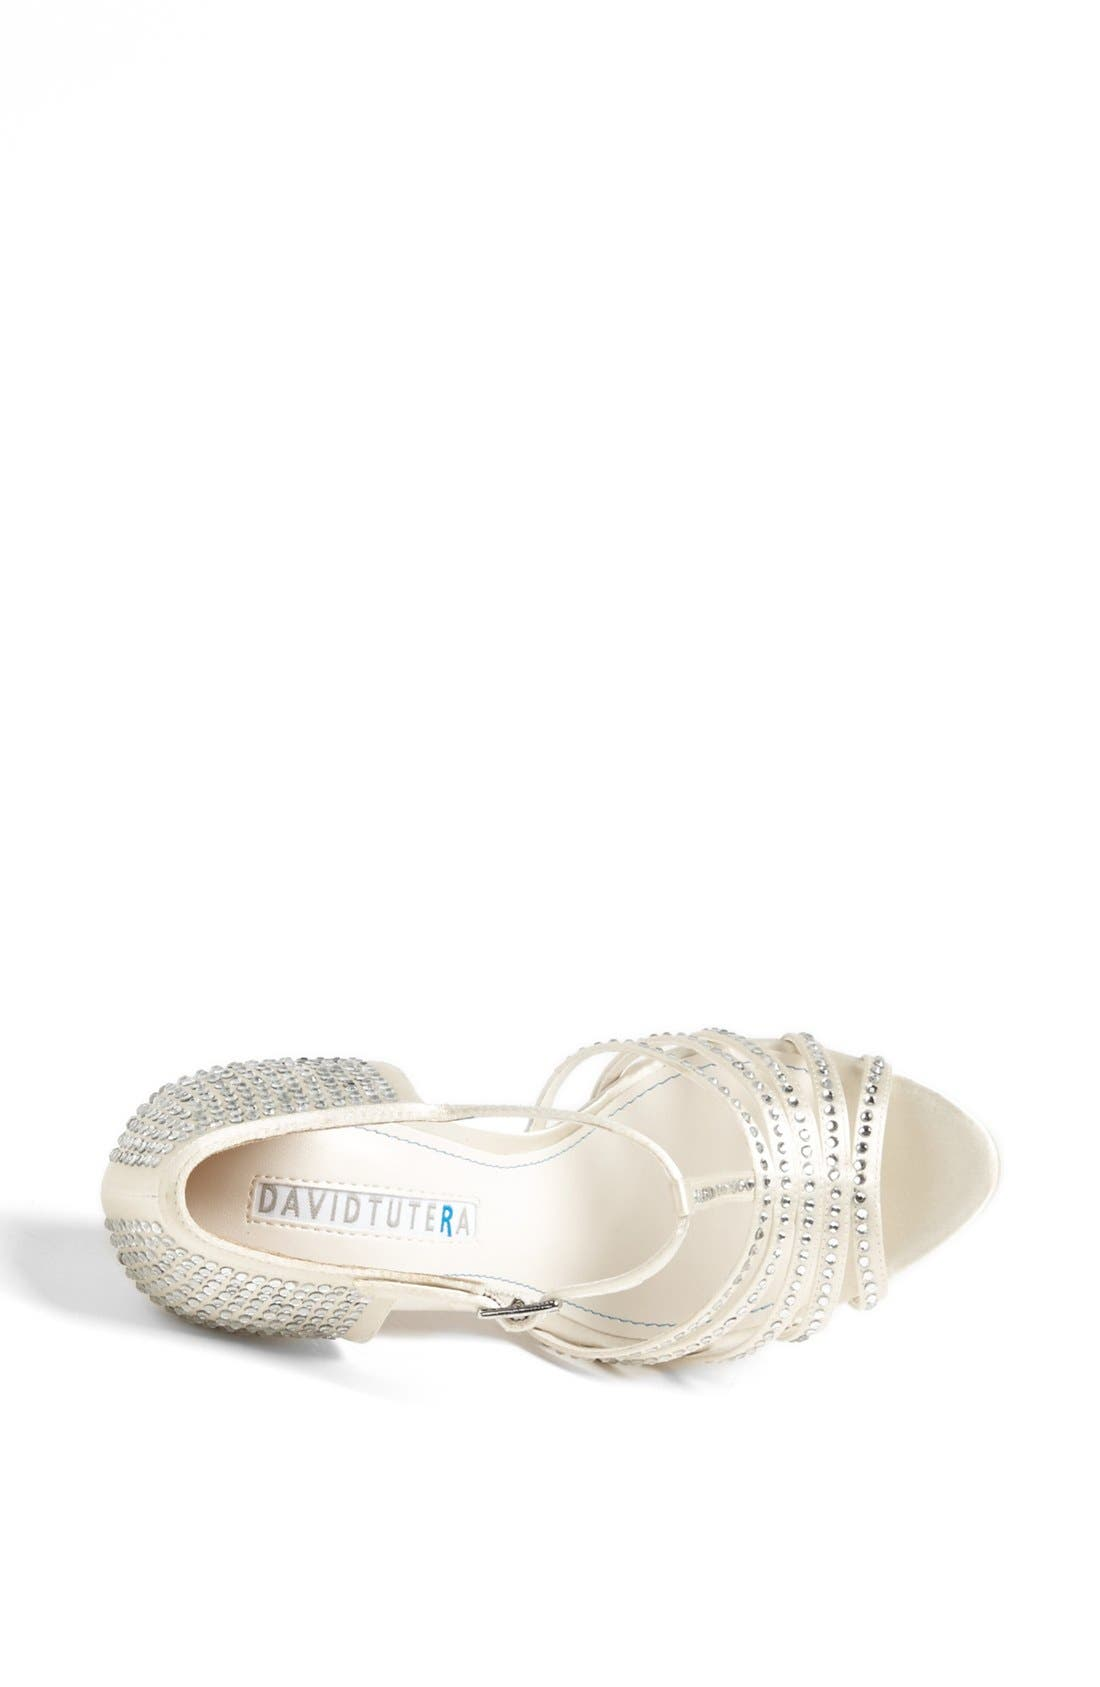 Alternate Image 3  - David Tutera 'Wonderful' T-Strap Sandal